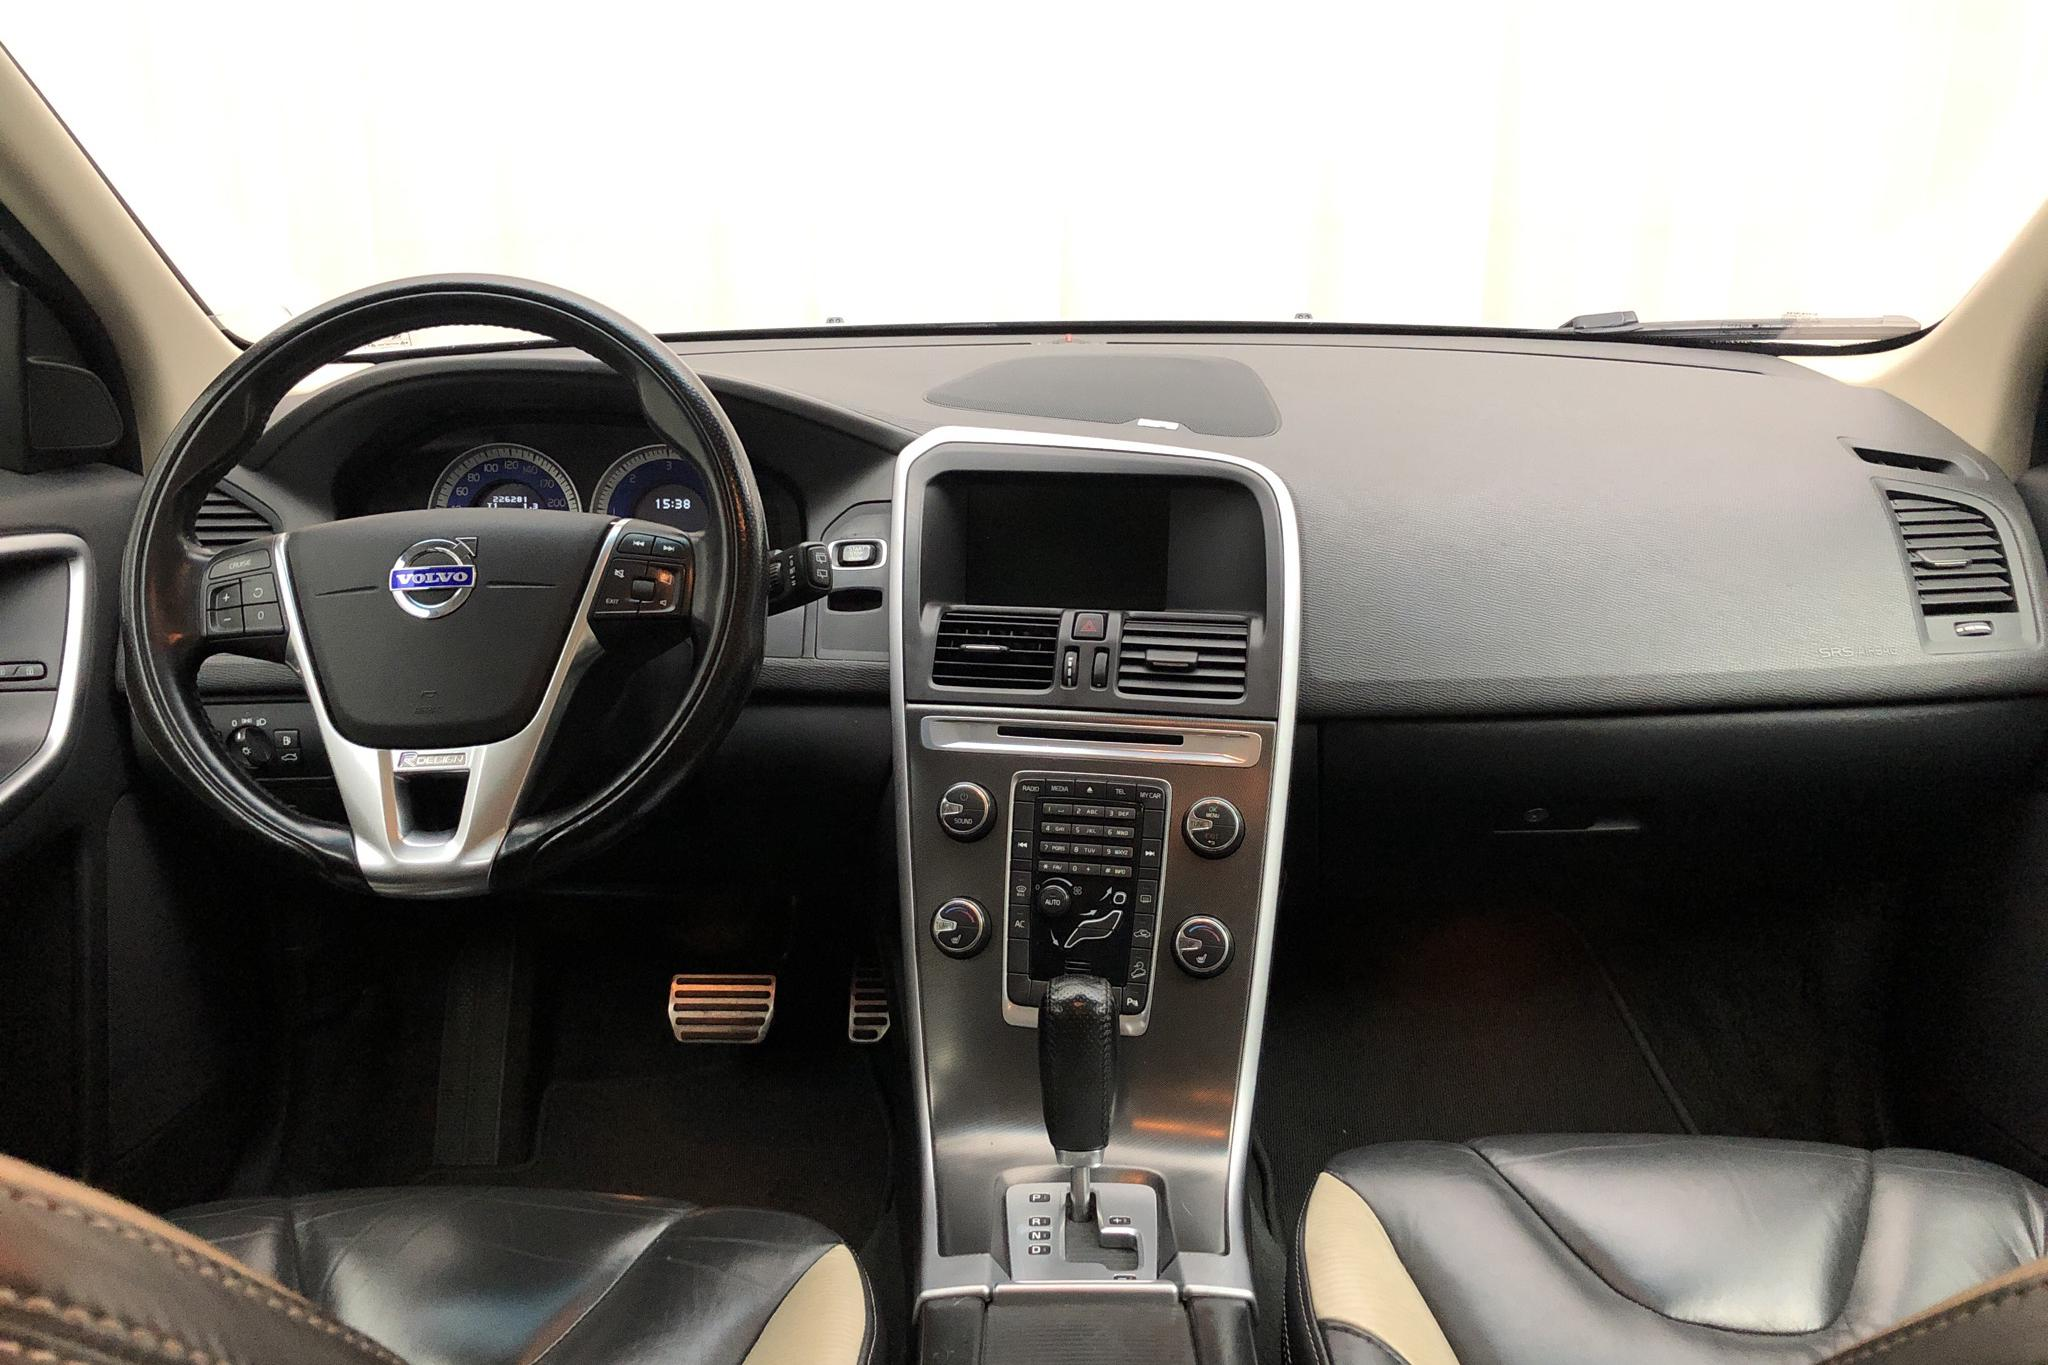 Volvo XC60 D3 AWD (163hk) - 226 280 km - Automatic - silver - 2012